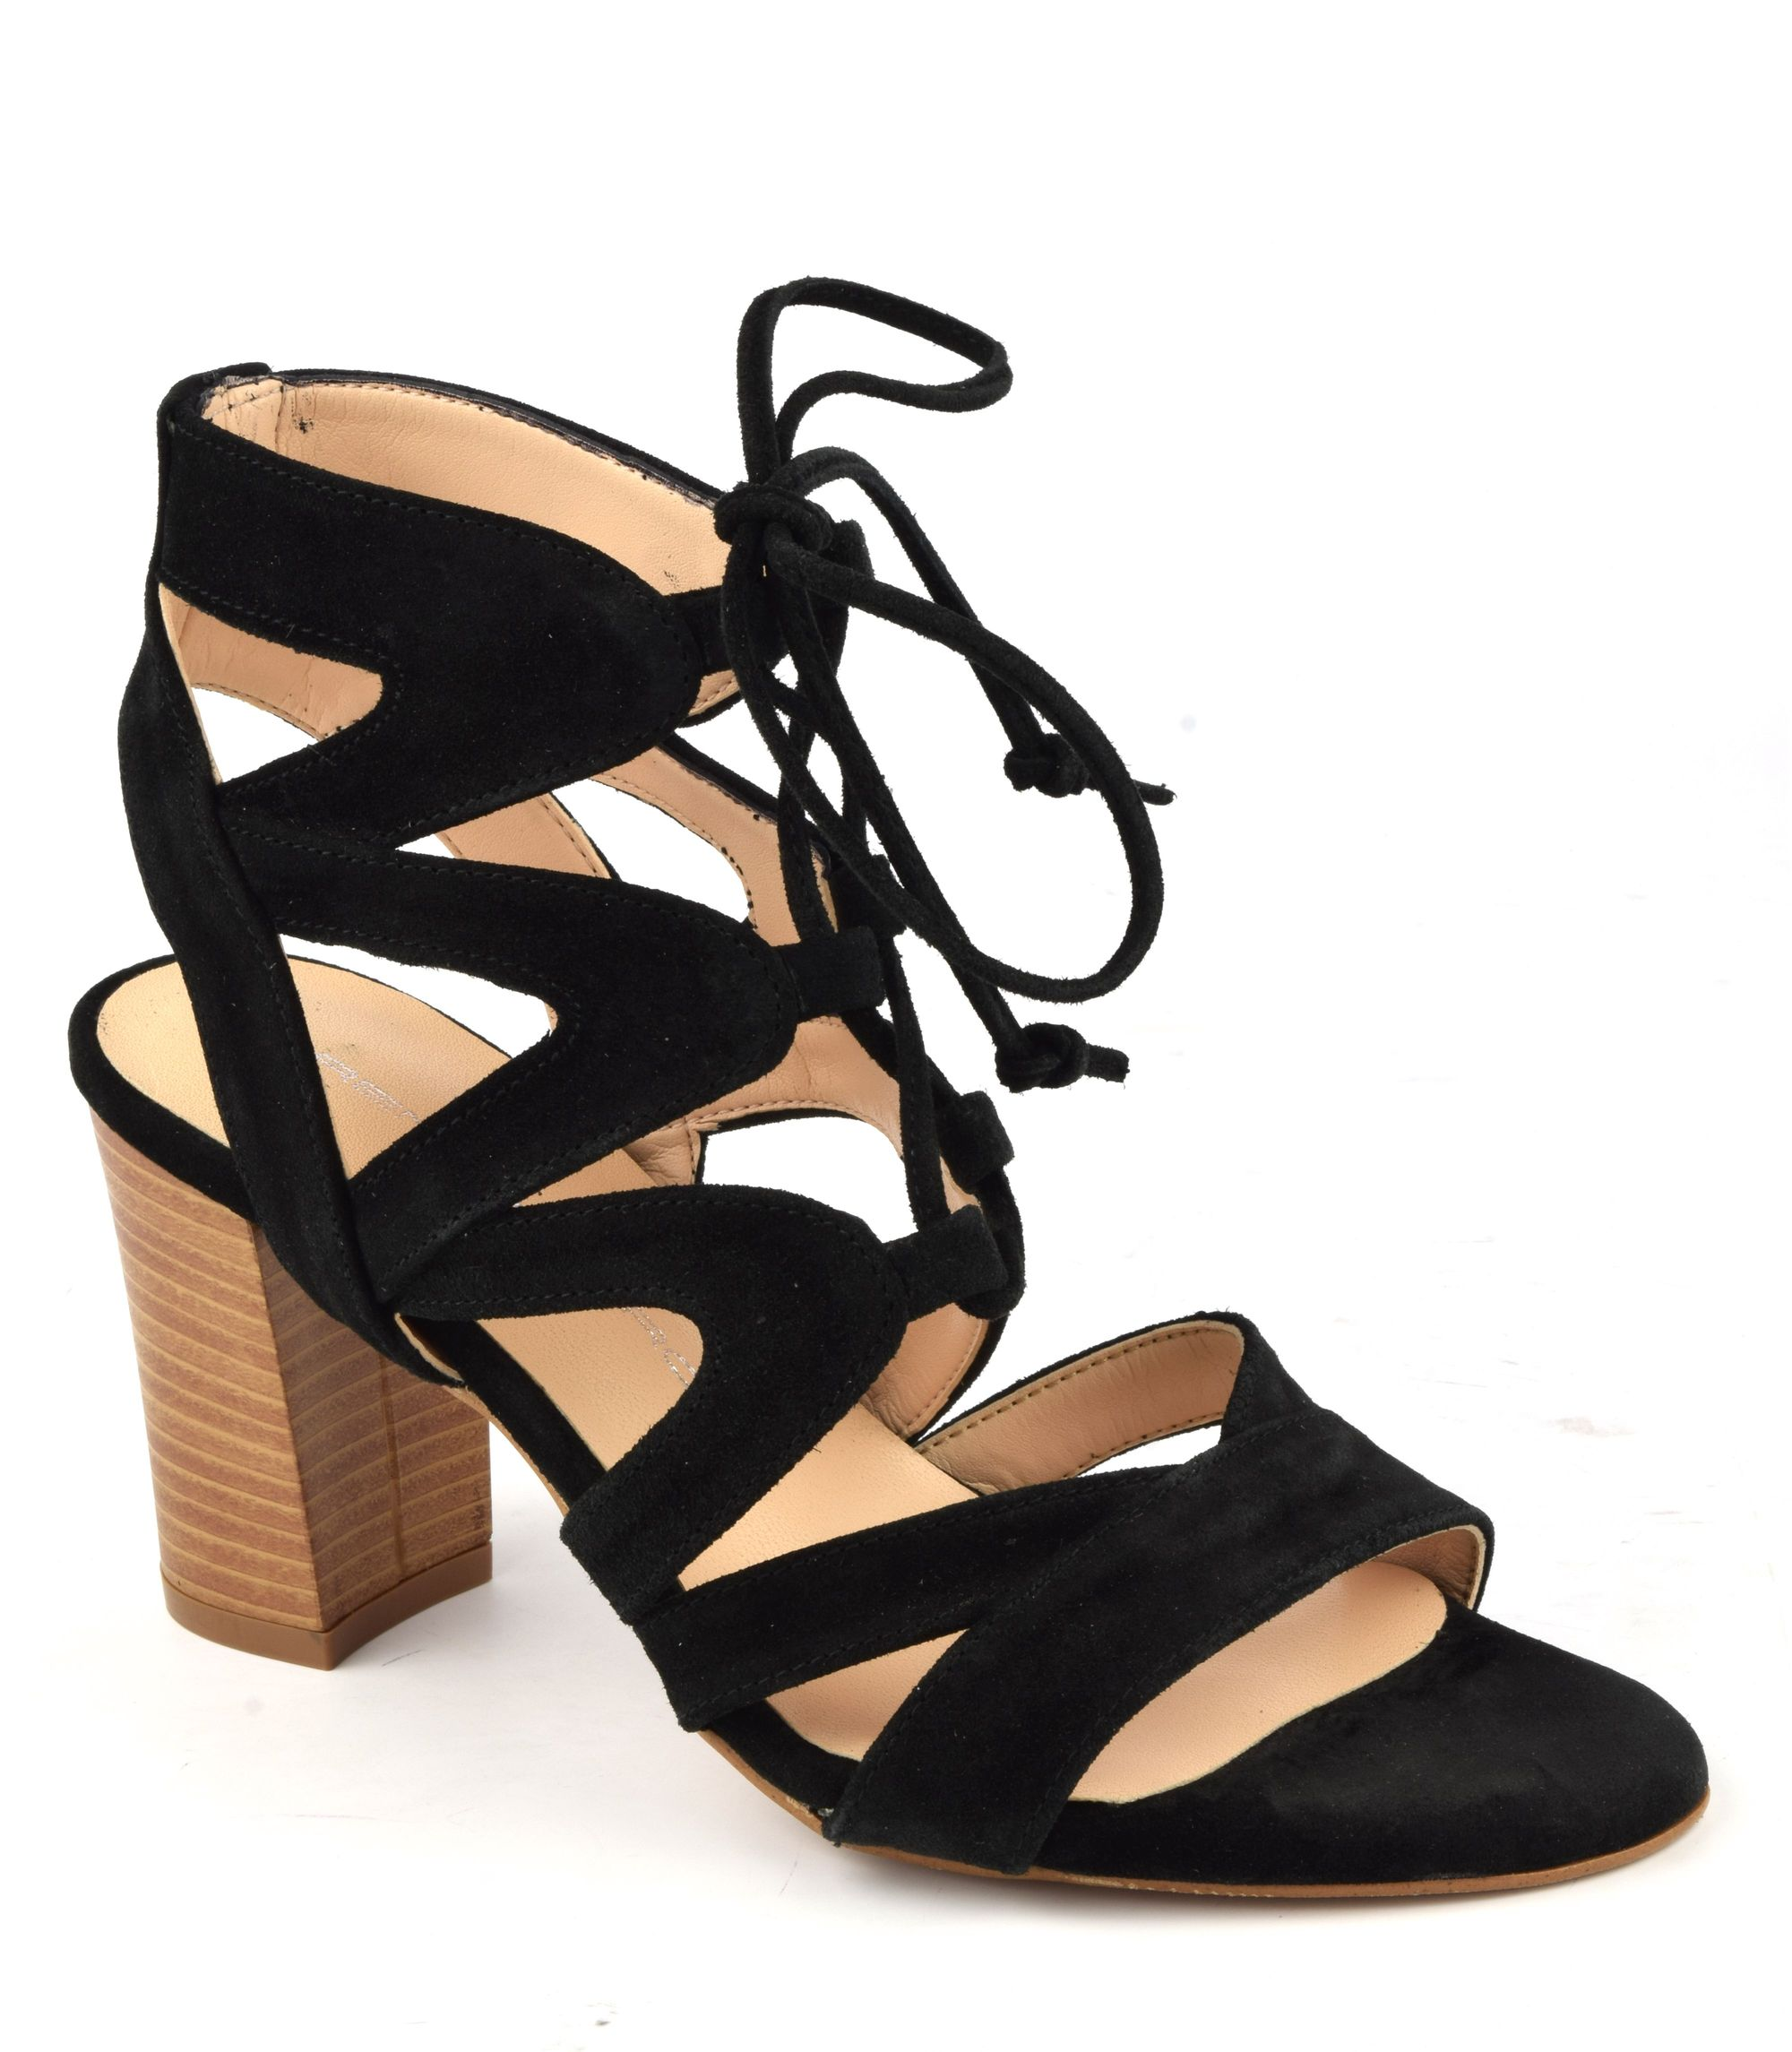 Sandales montantes lacet daim noir F3259, marque brenda Zaro